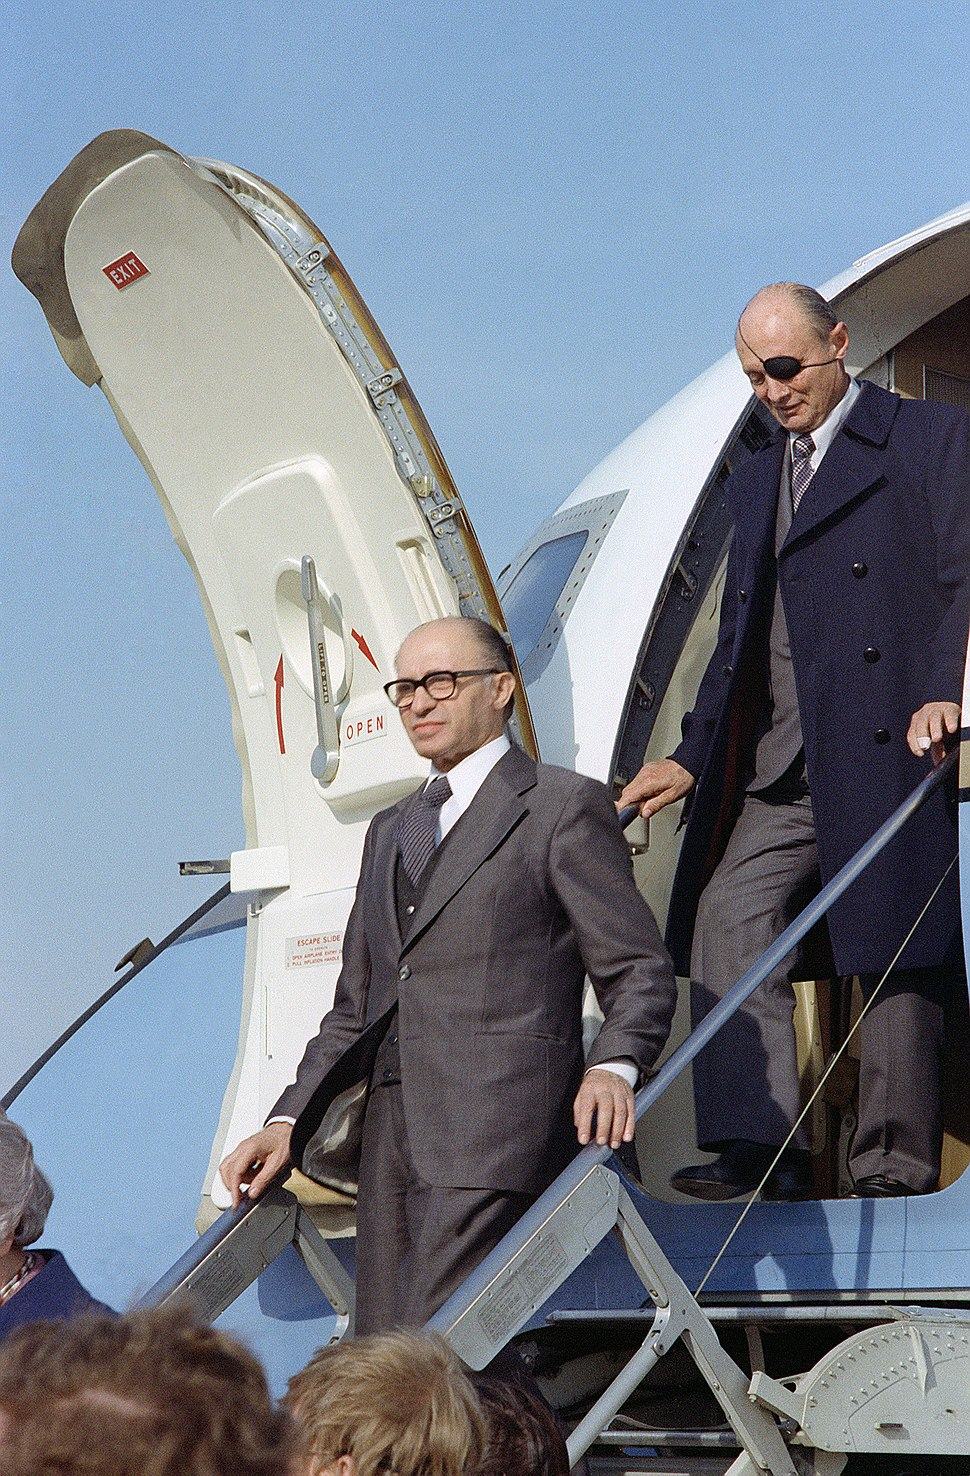 Menachem Begin and Moshe Dayan exits from an aircraft.JPEG